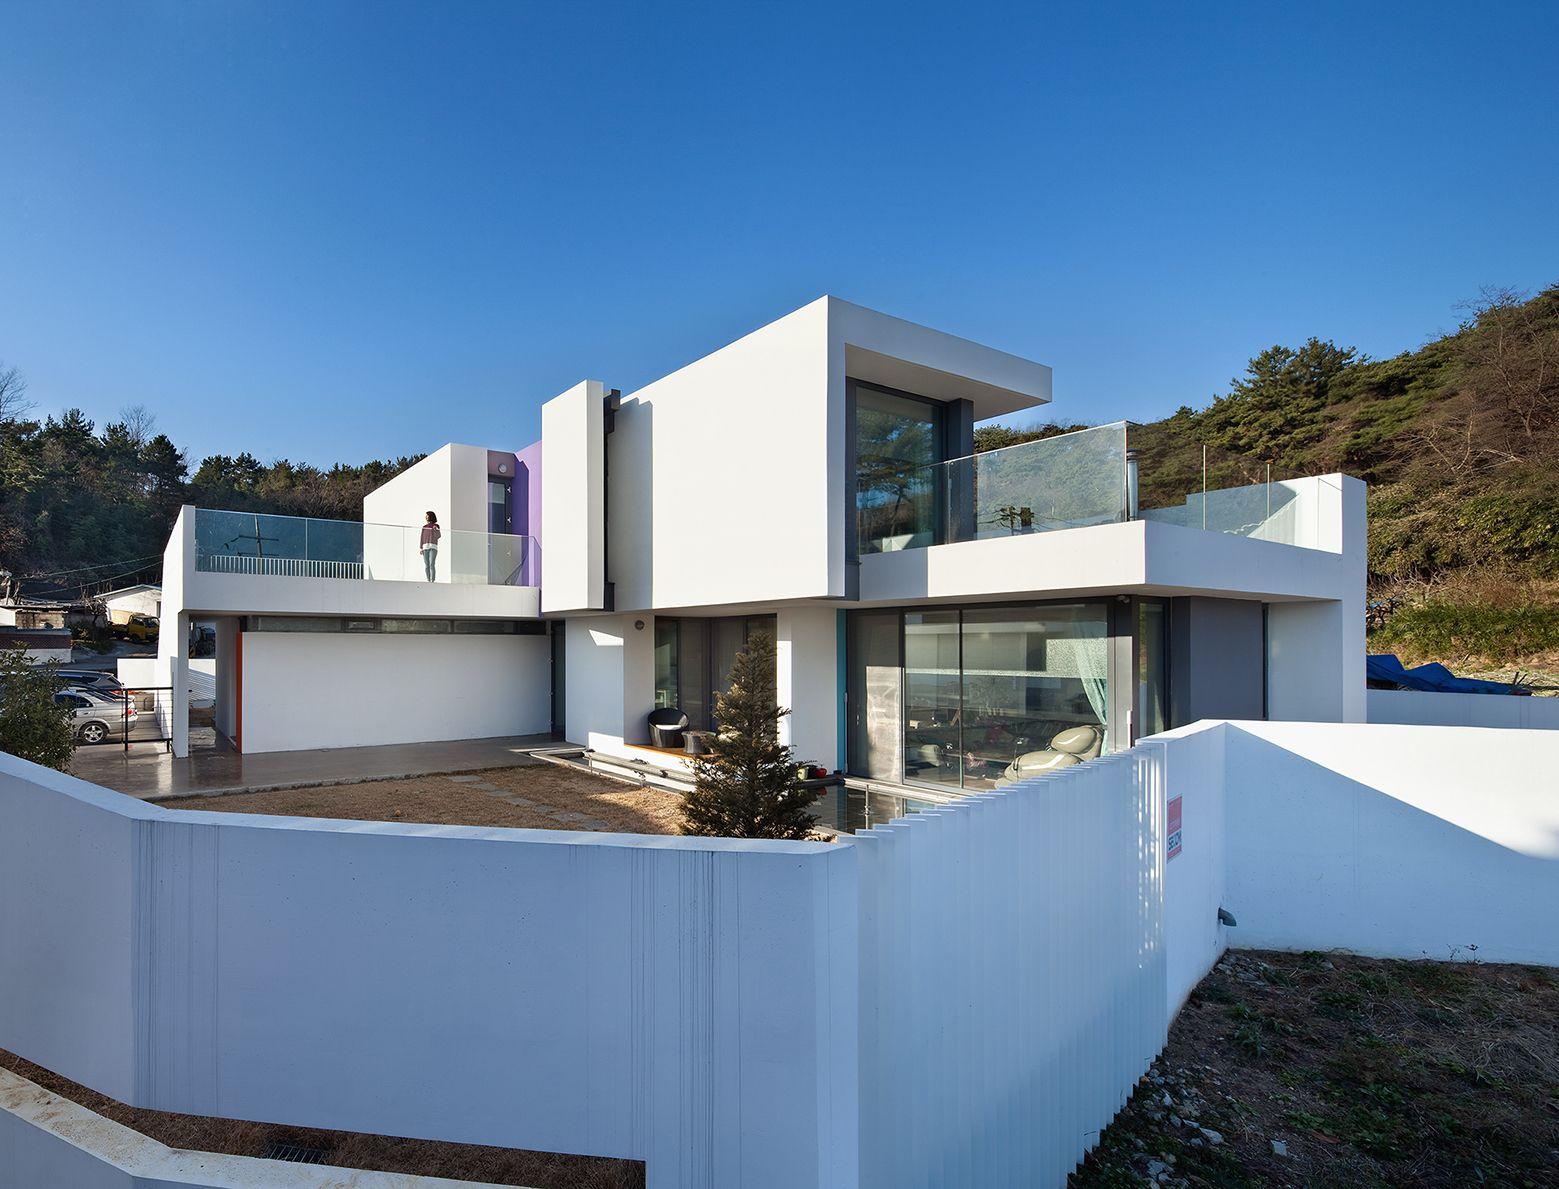 Galeria de Casa Woljam-ri / JMY architects - 9